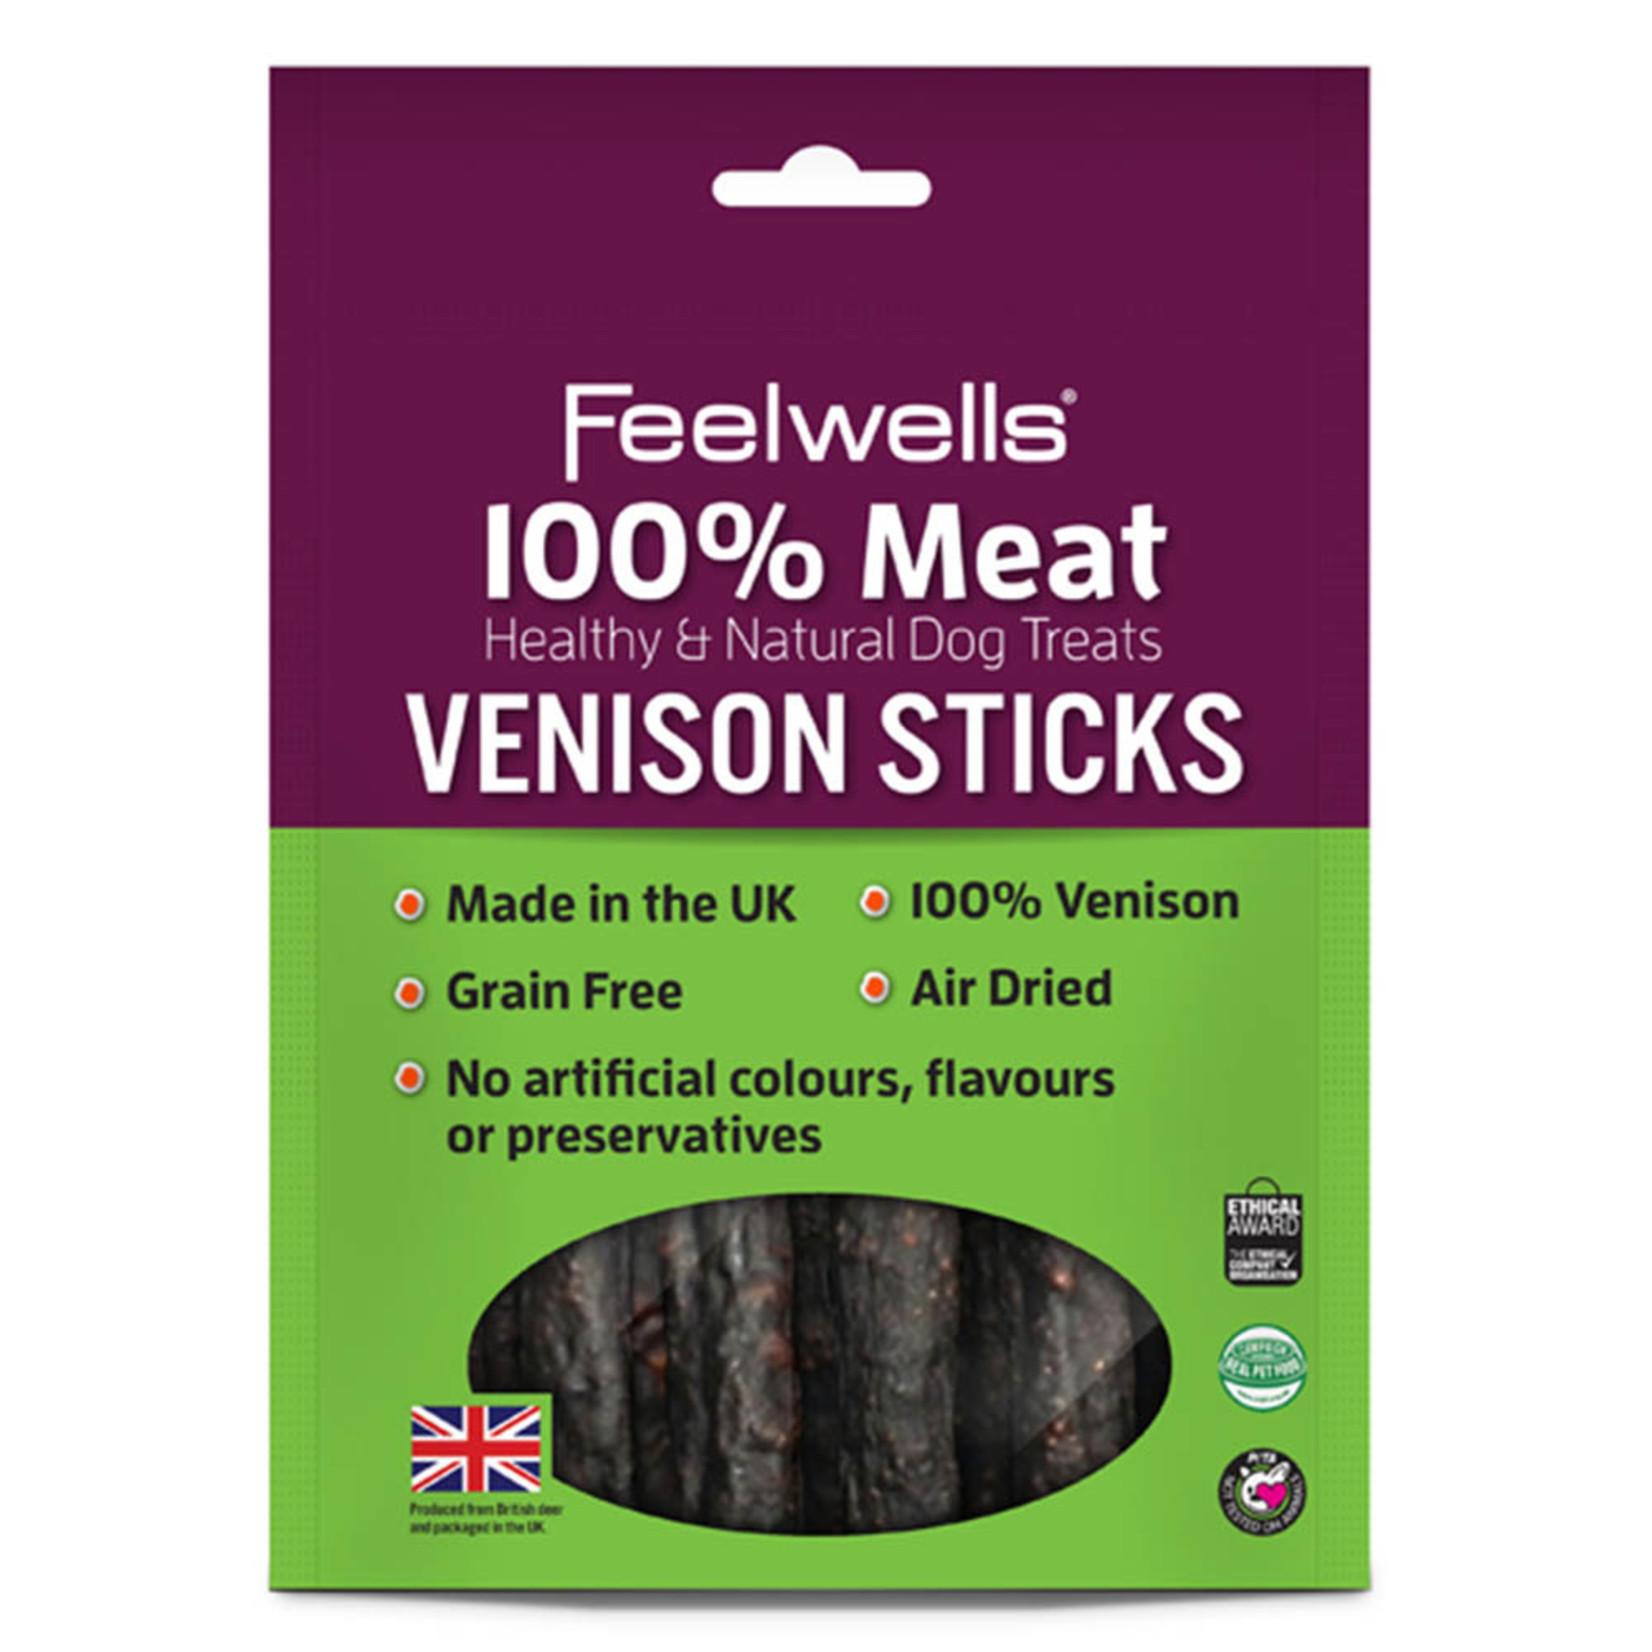 Feelwells 100% Meat Healthy & Natural Dog Treats Venison Sticks, 100g